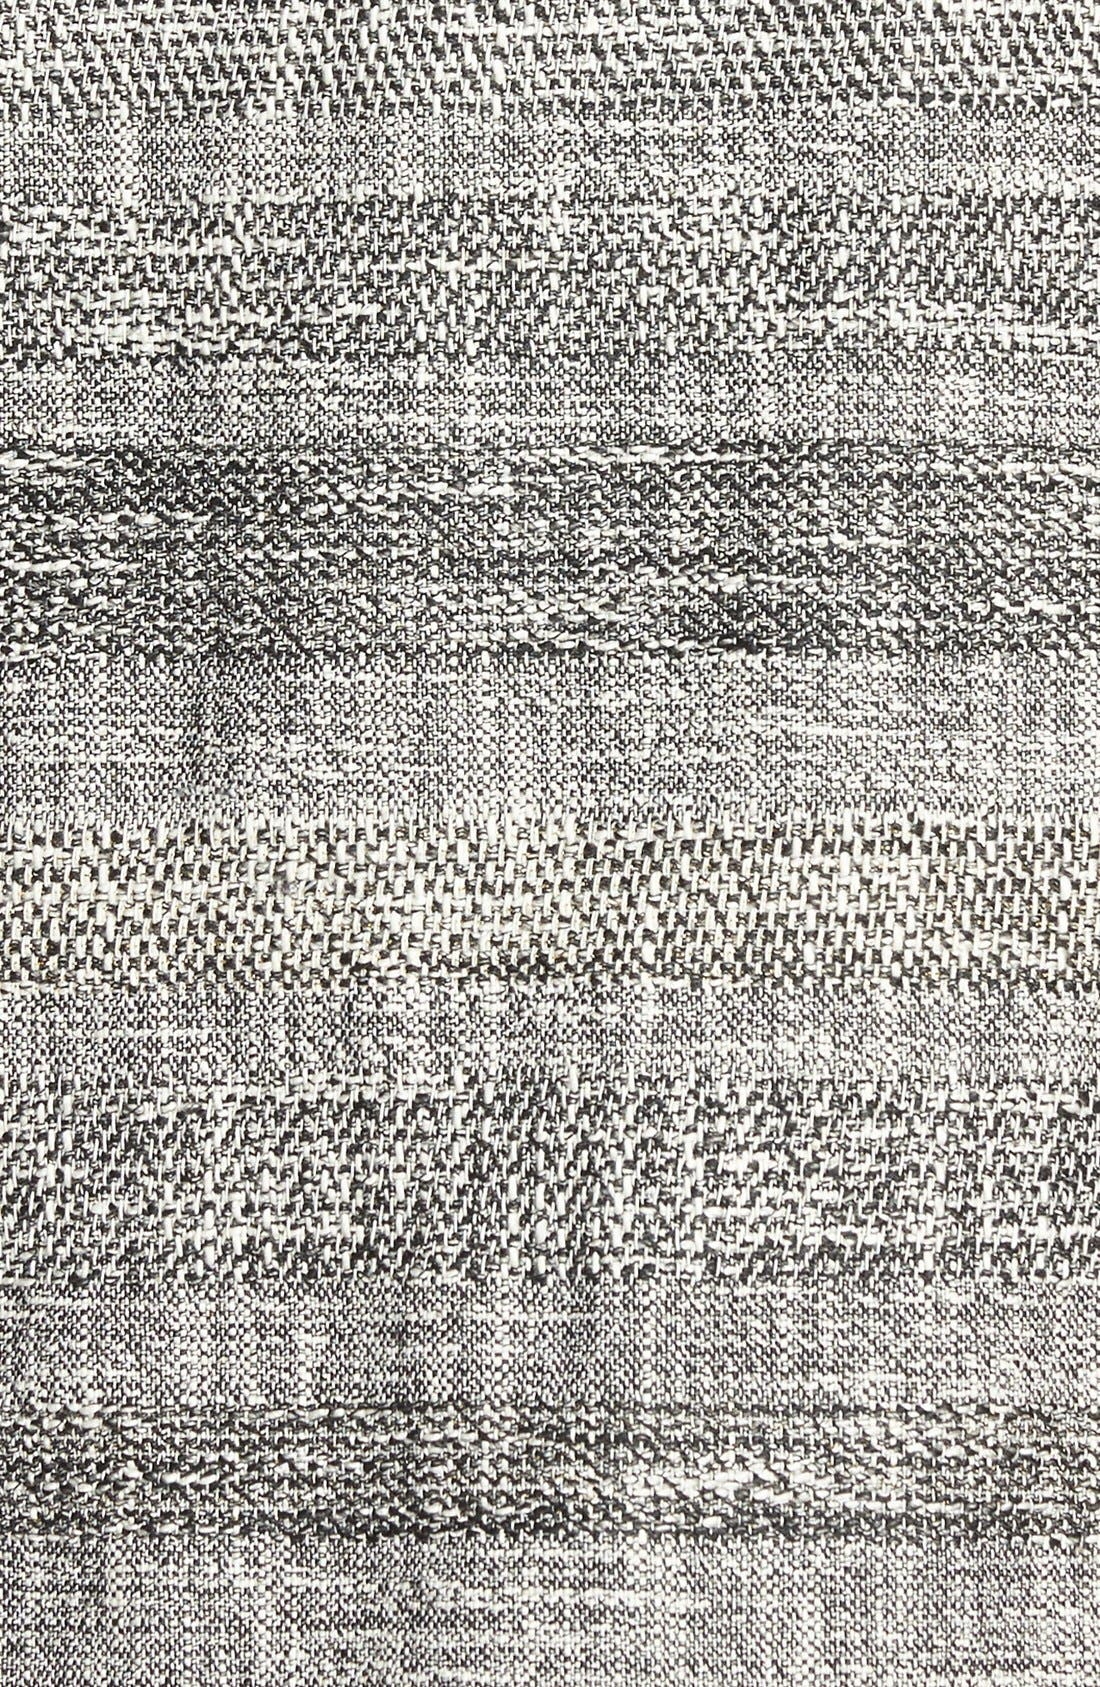 Alternate Image 3  - BOSS 'Dalomi' Tweed Panel Shift Dress